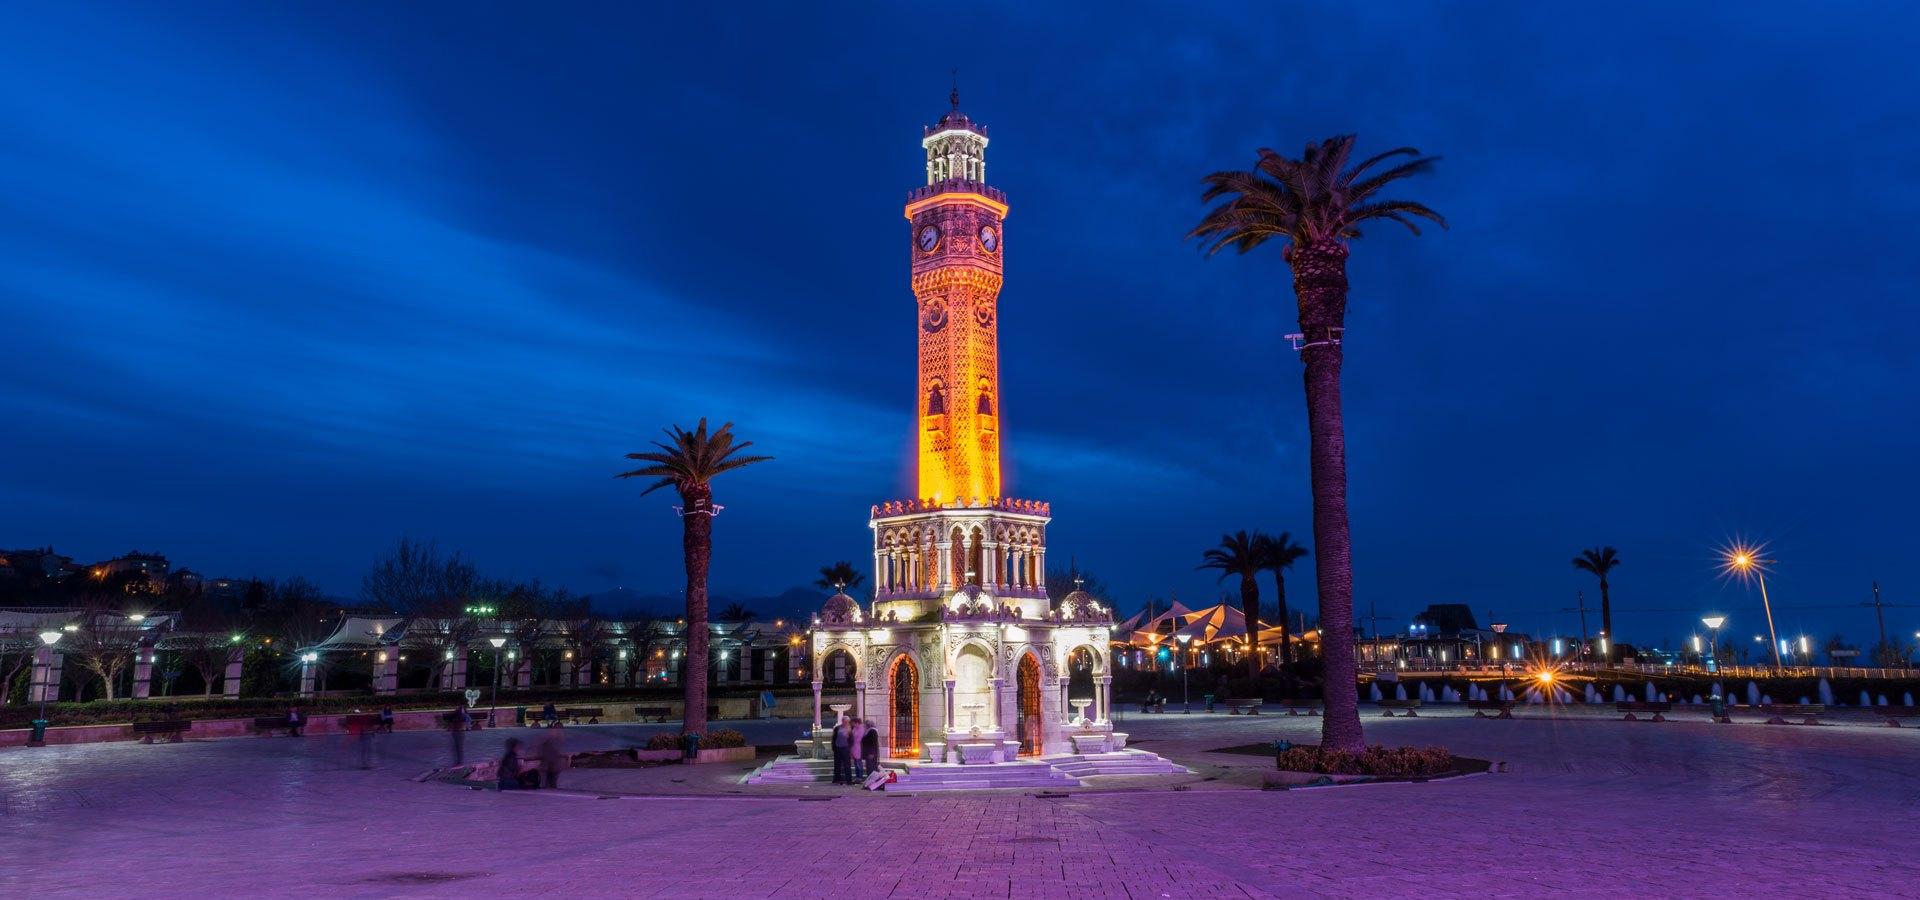 Cosa Comprare A Izmir izmir, places to visit?